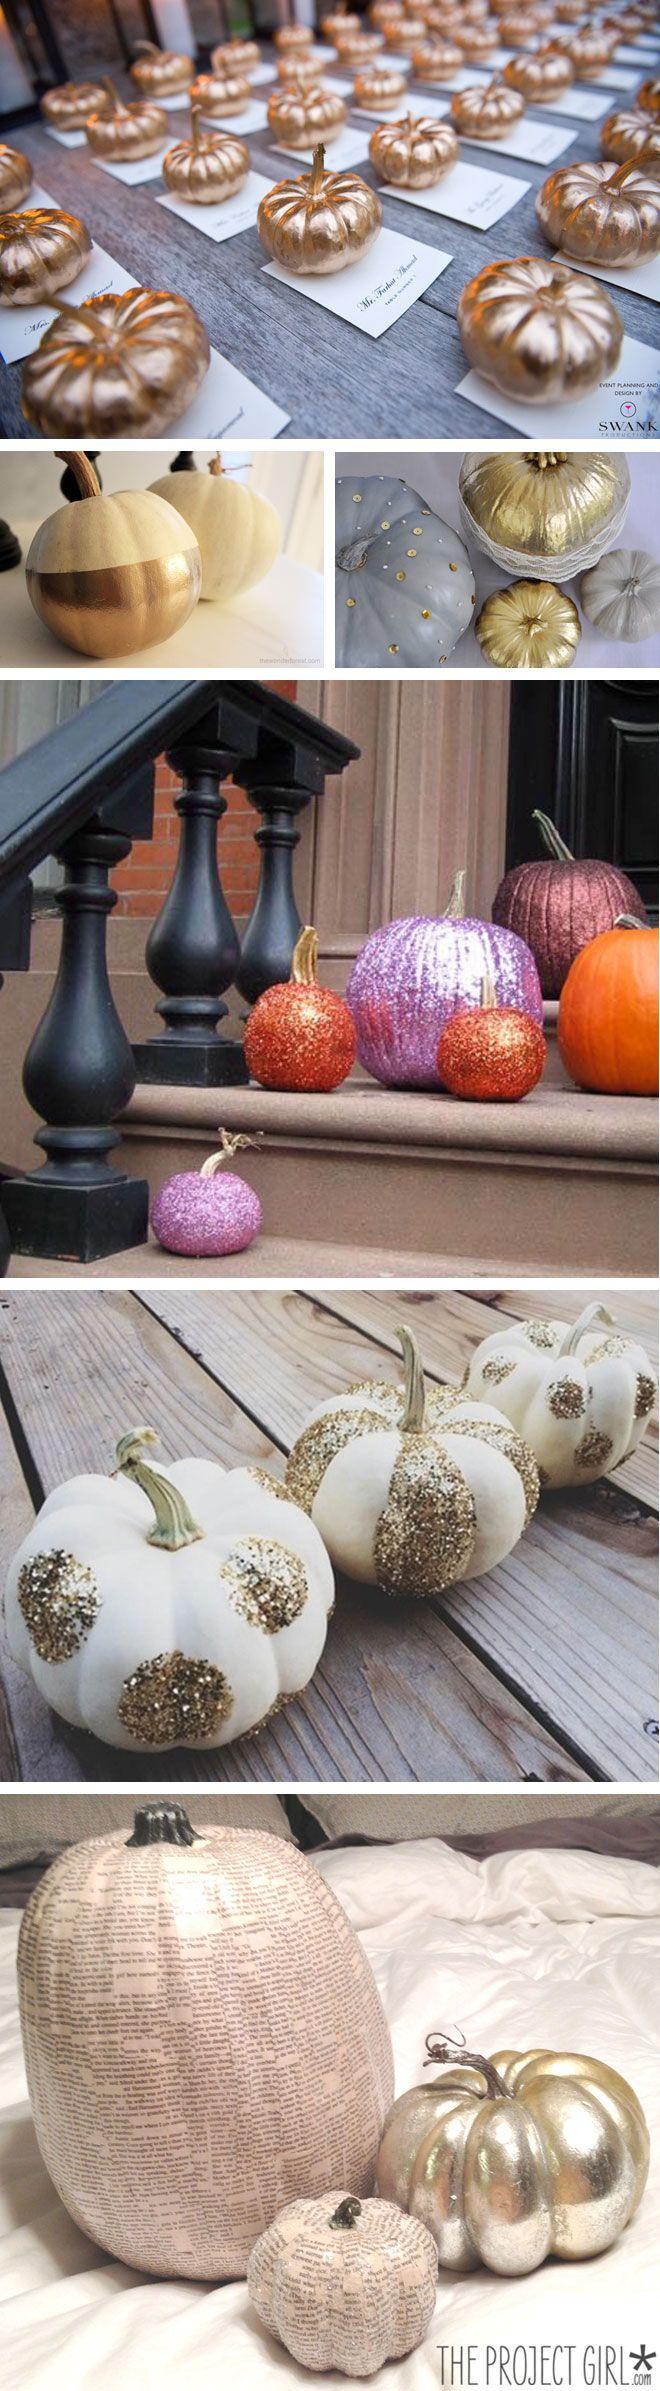 Zombie wedding decorations november 2018  best Fairy tale wedding images on Pinterest  Halloween crafts